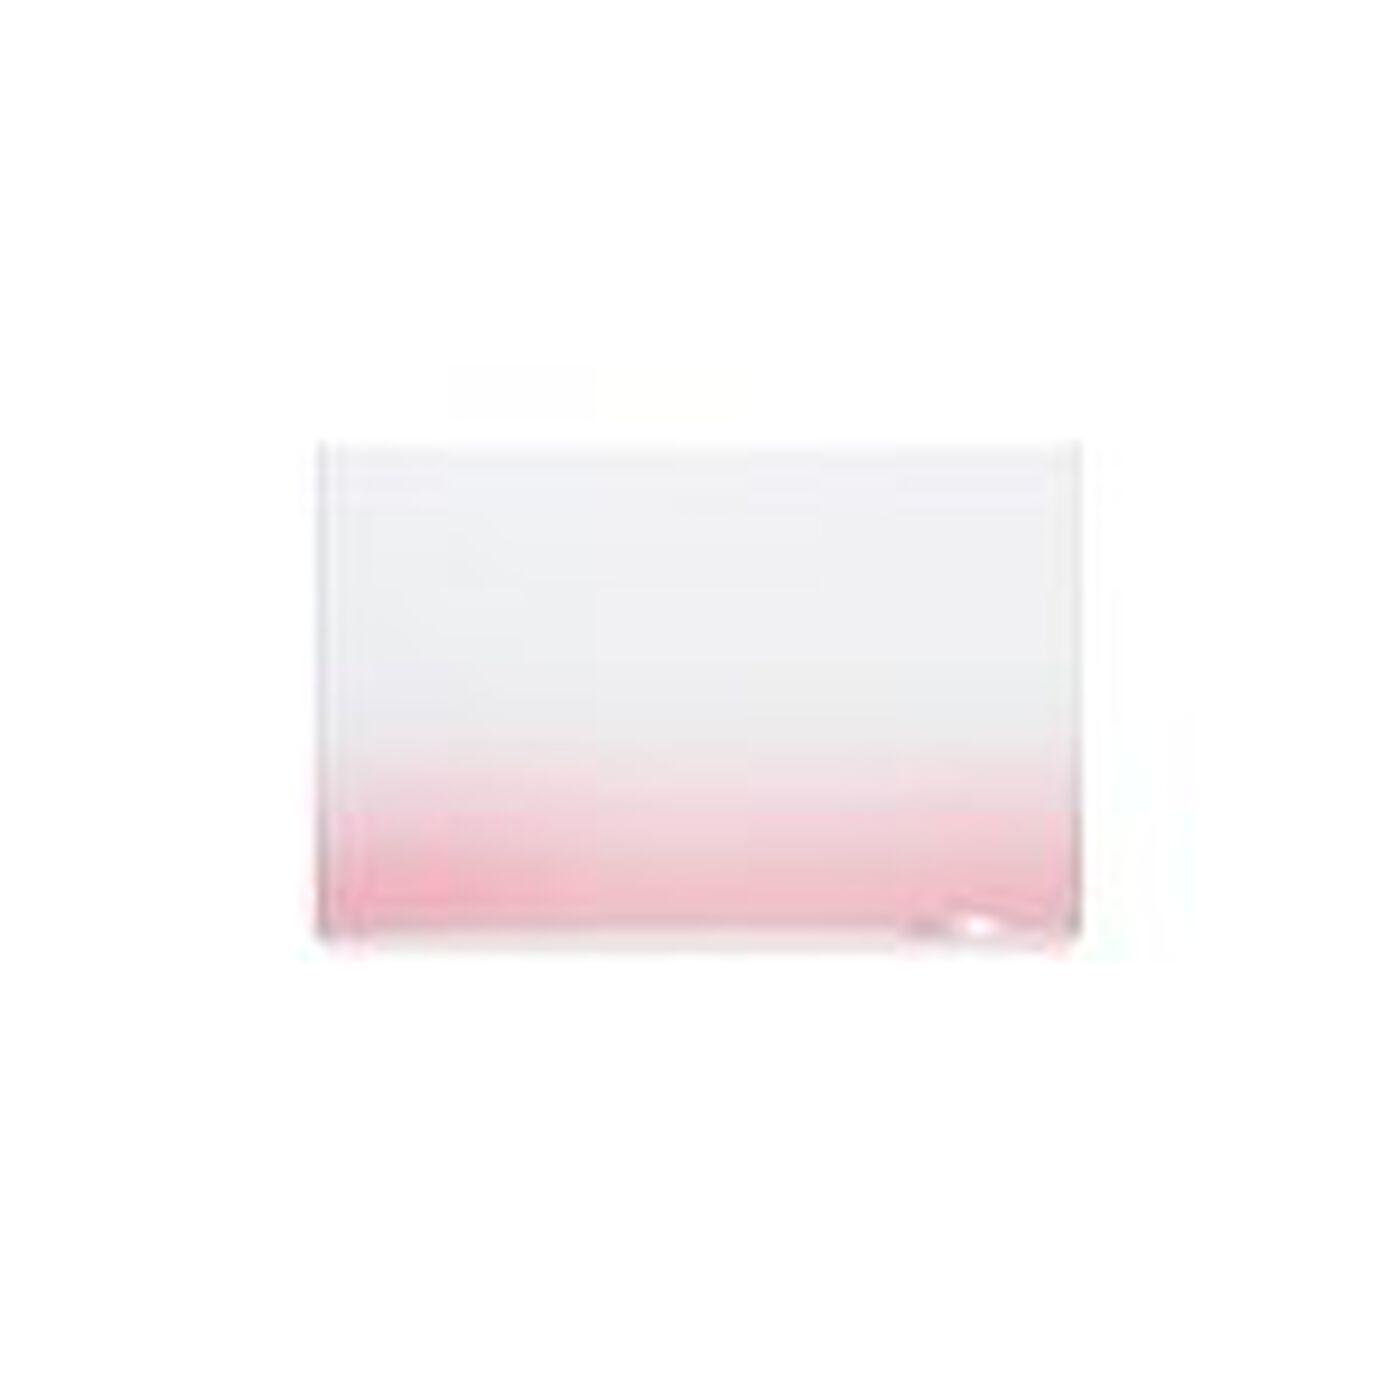 White Plus Pure Translucency White Plus Brightning Powder Foundation Case